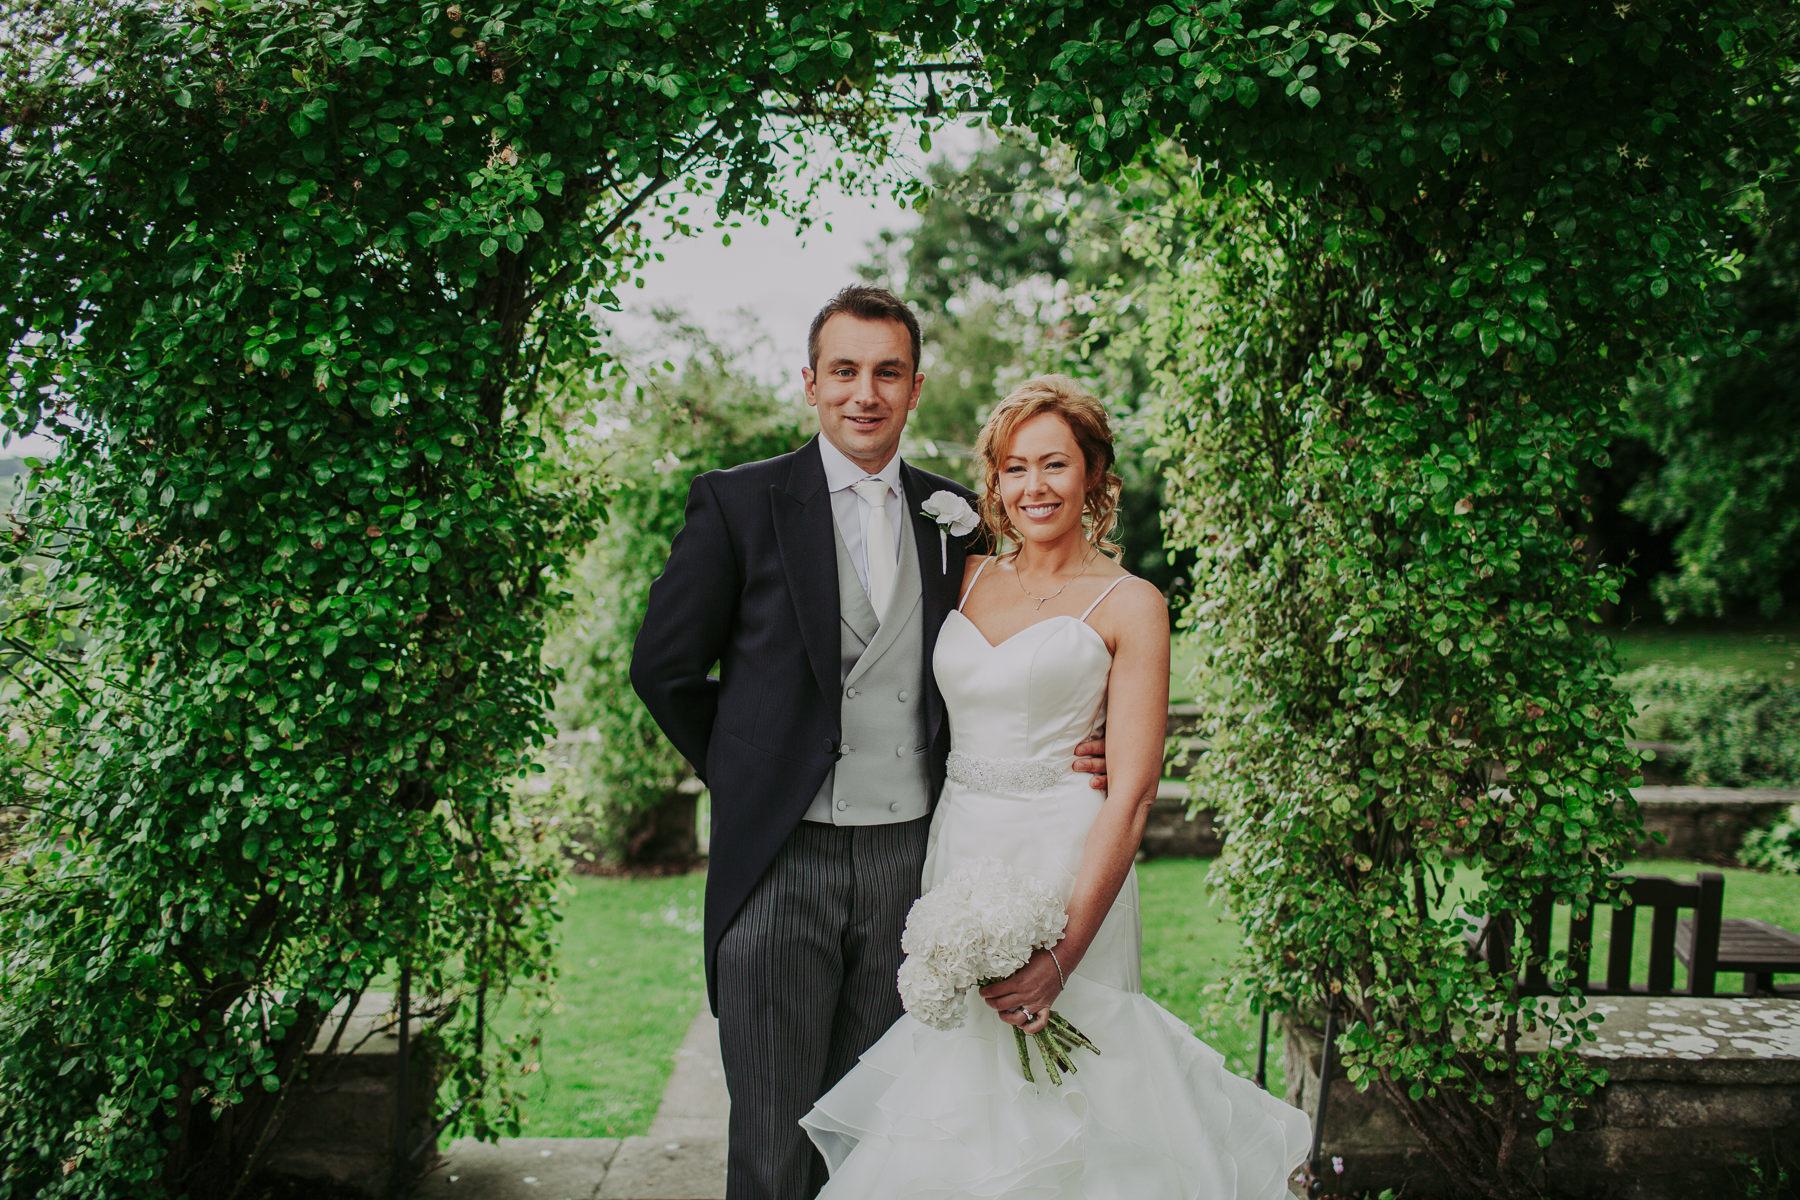 Wood Hall hotel Wedding